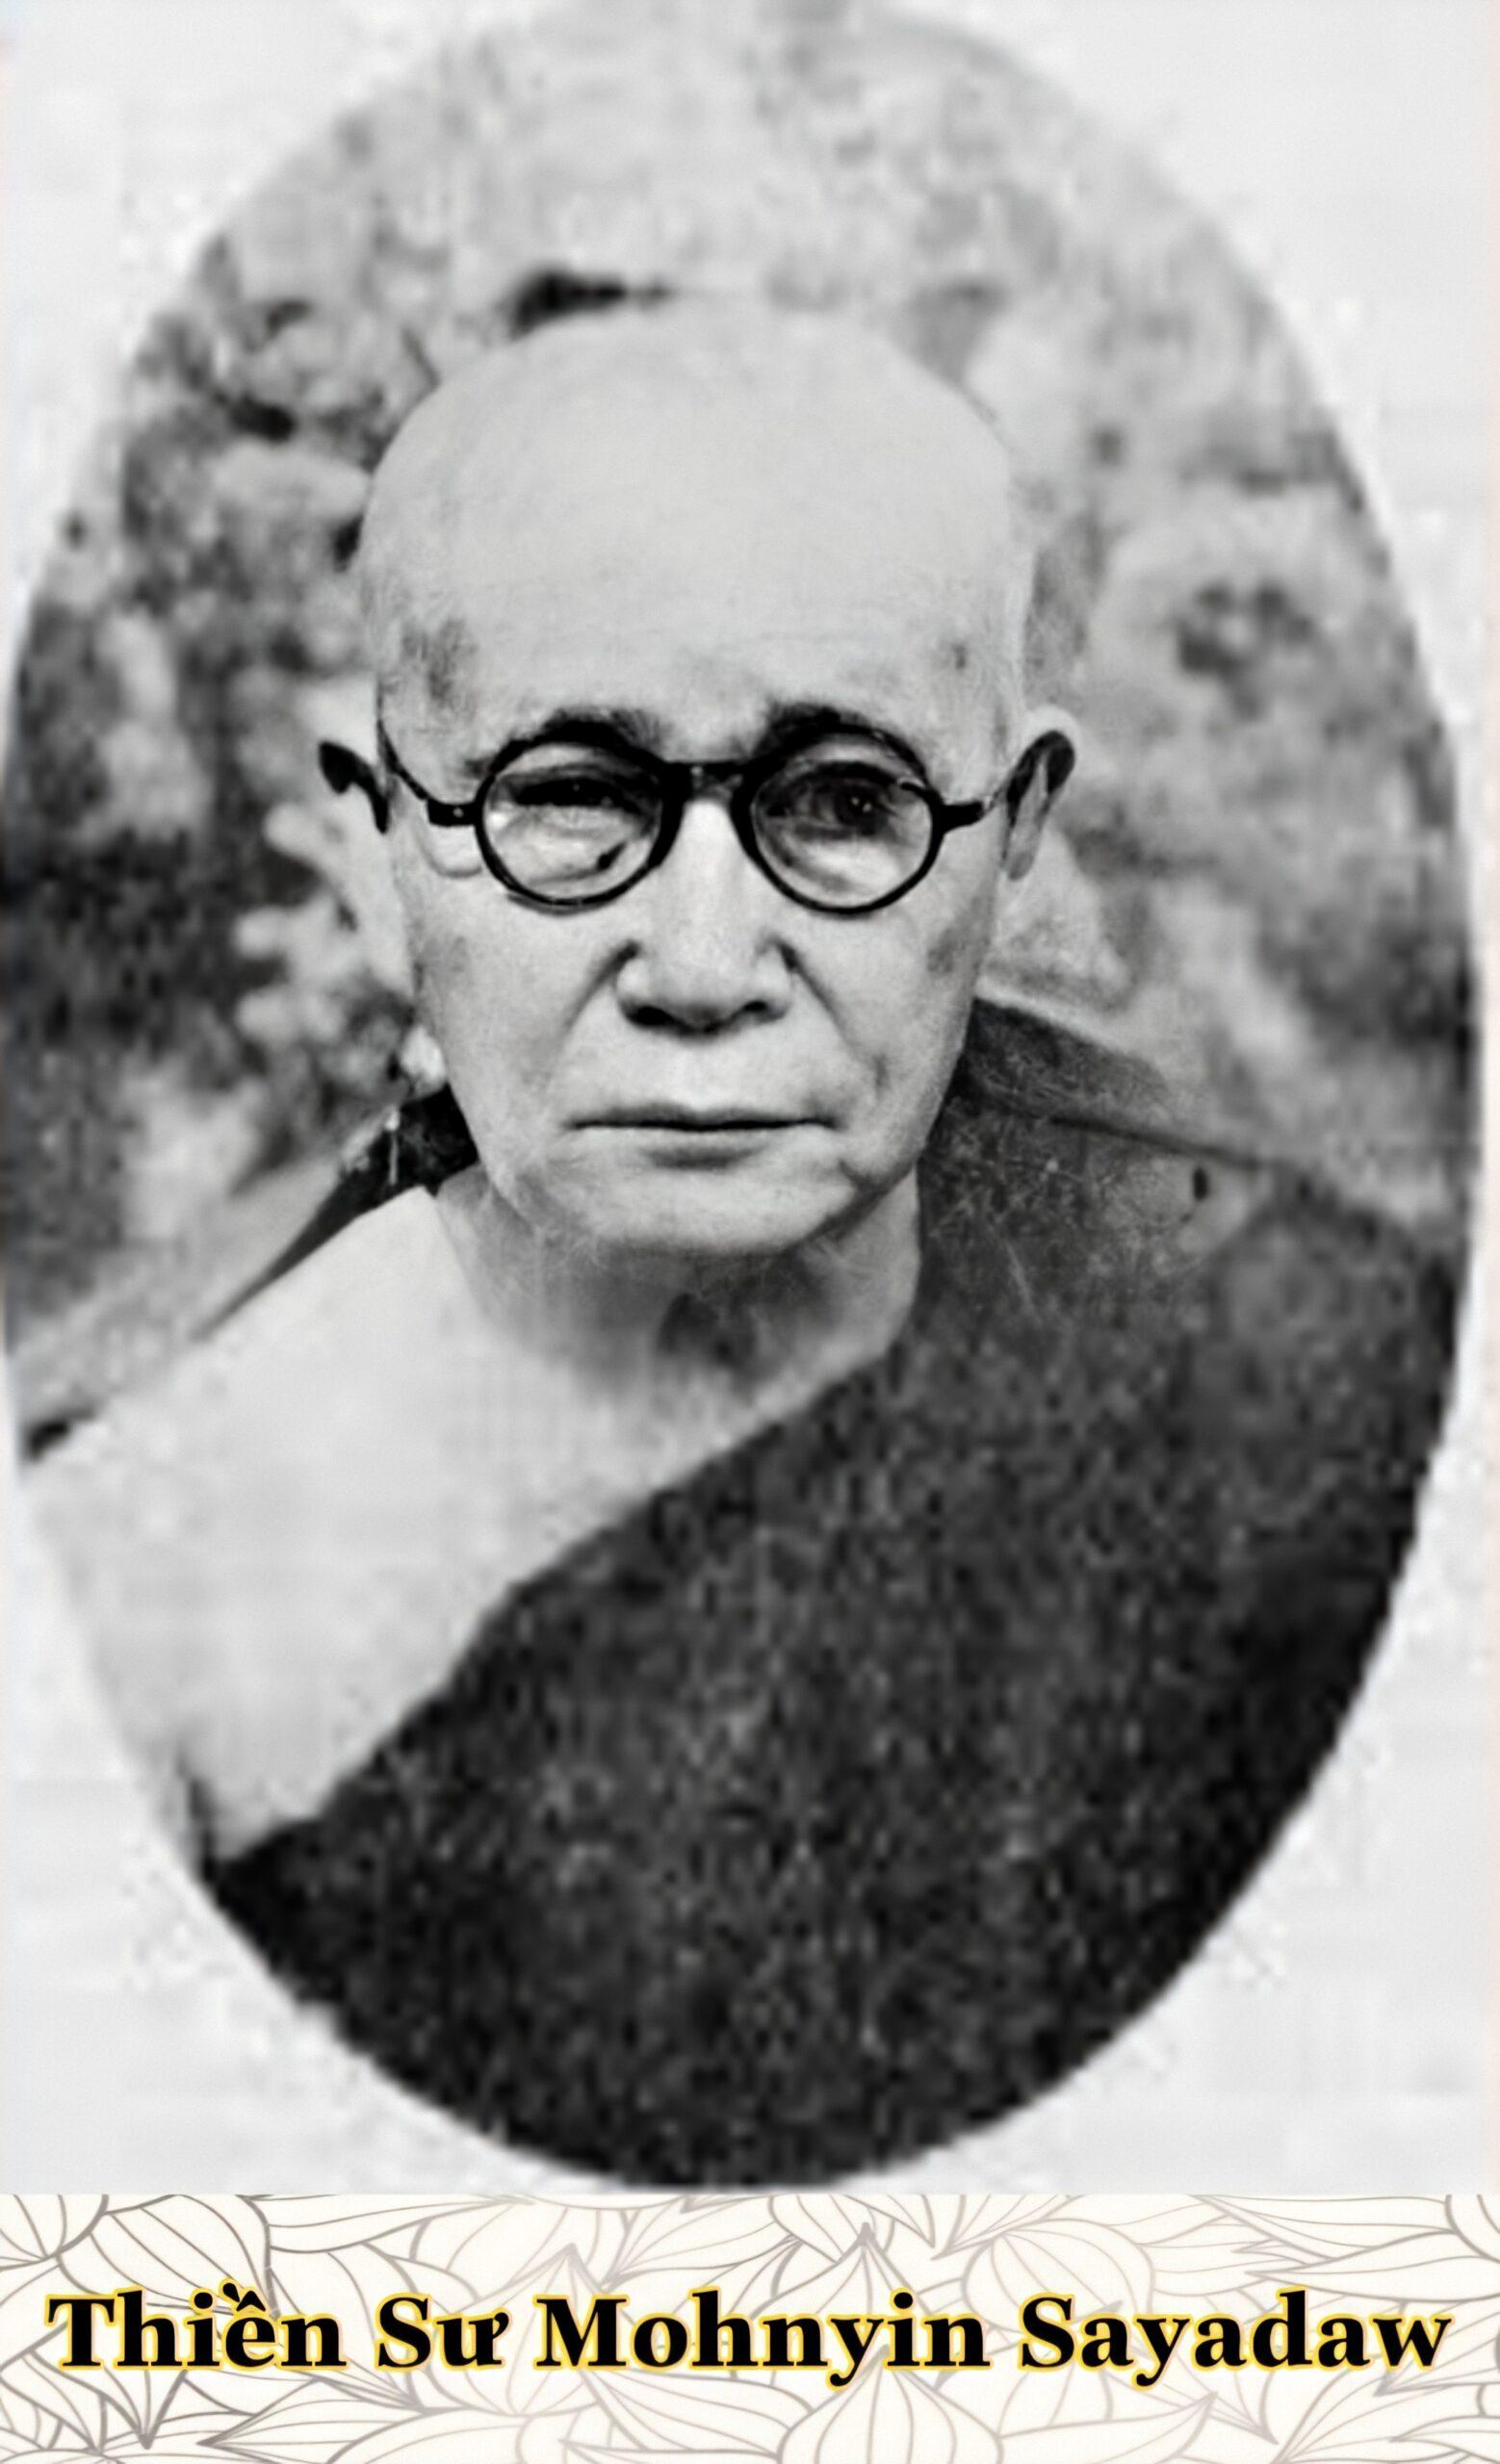 Thiền sư Mohnyin Sayadaw 1 scaled